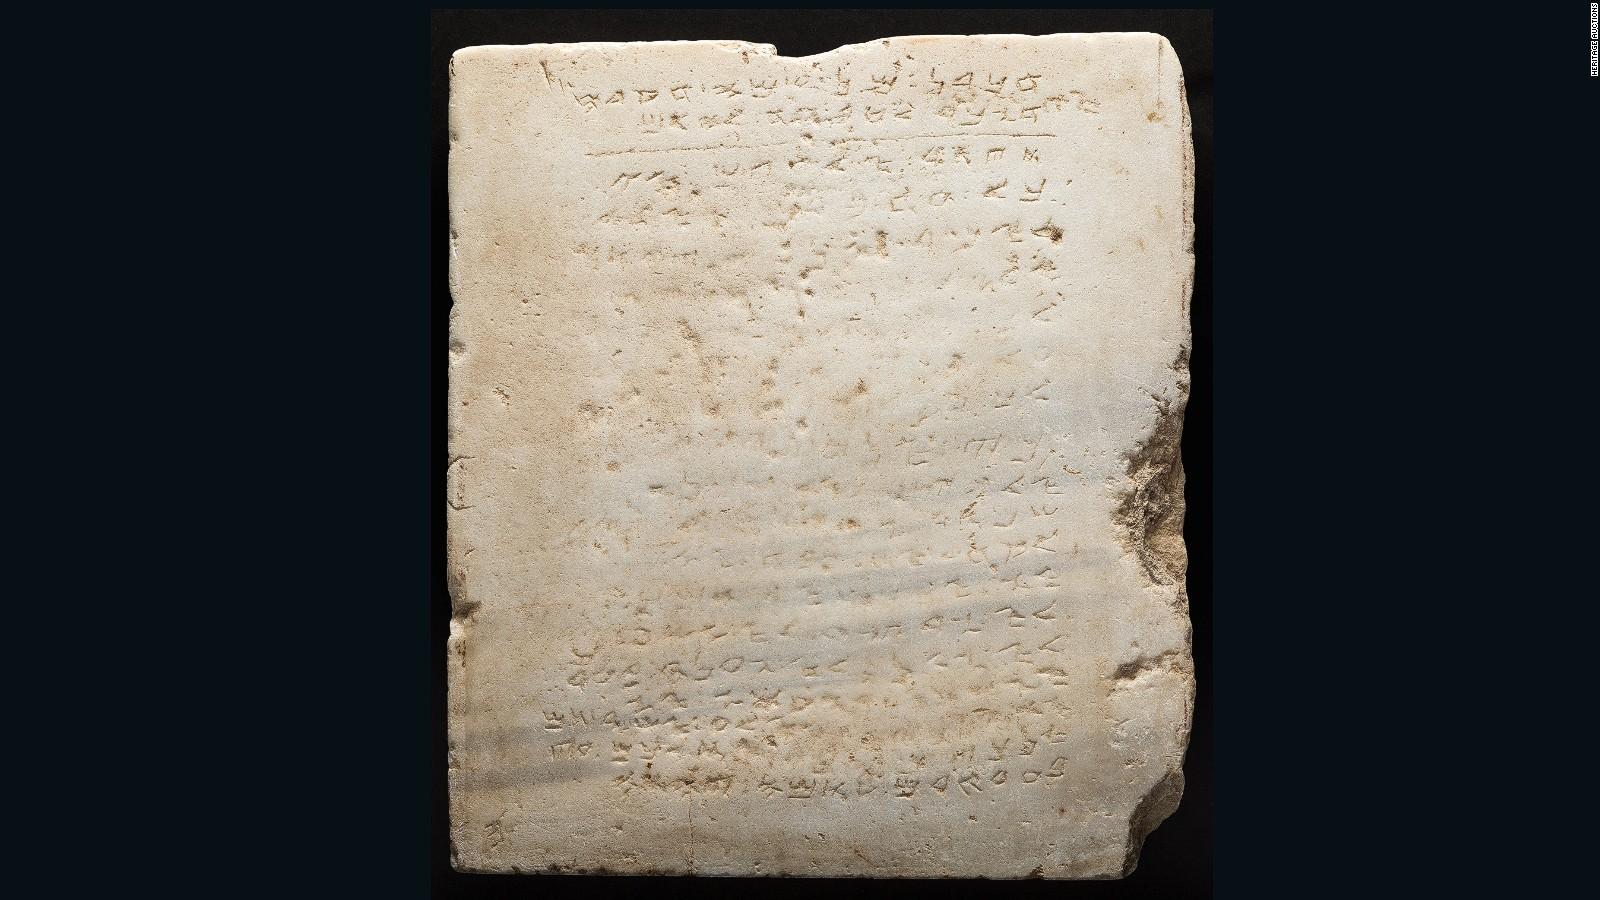 Ancient 10 Commandments Tablet Sold For 850K